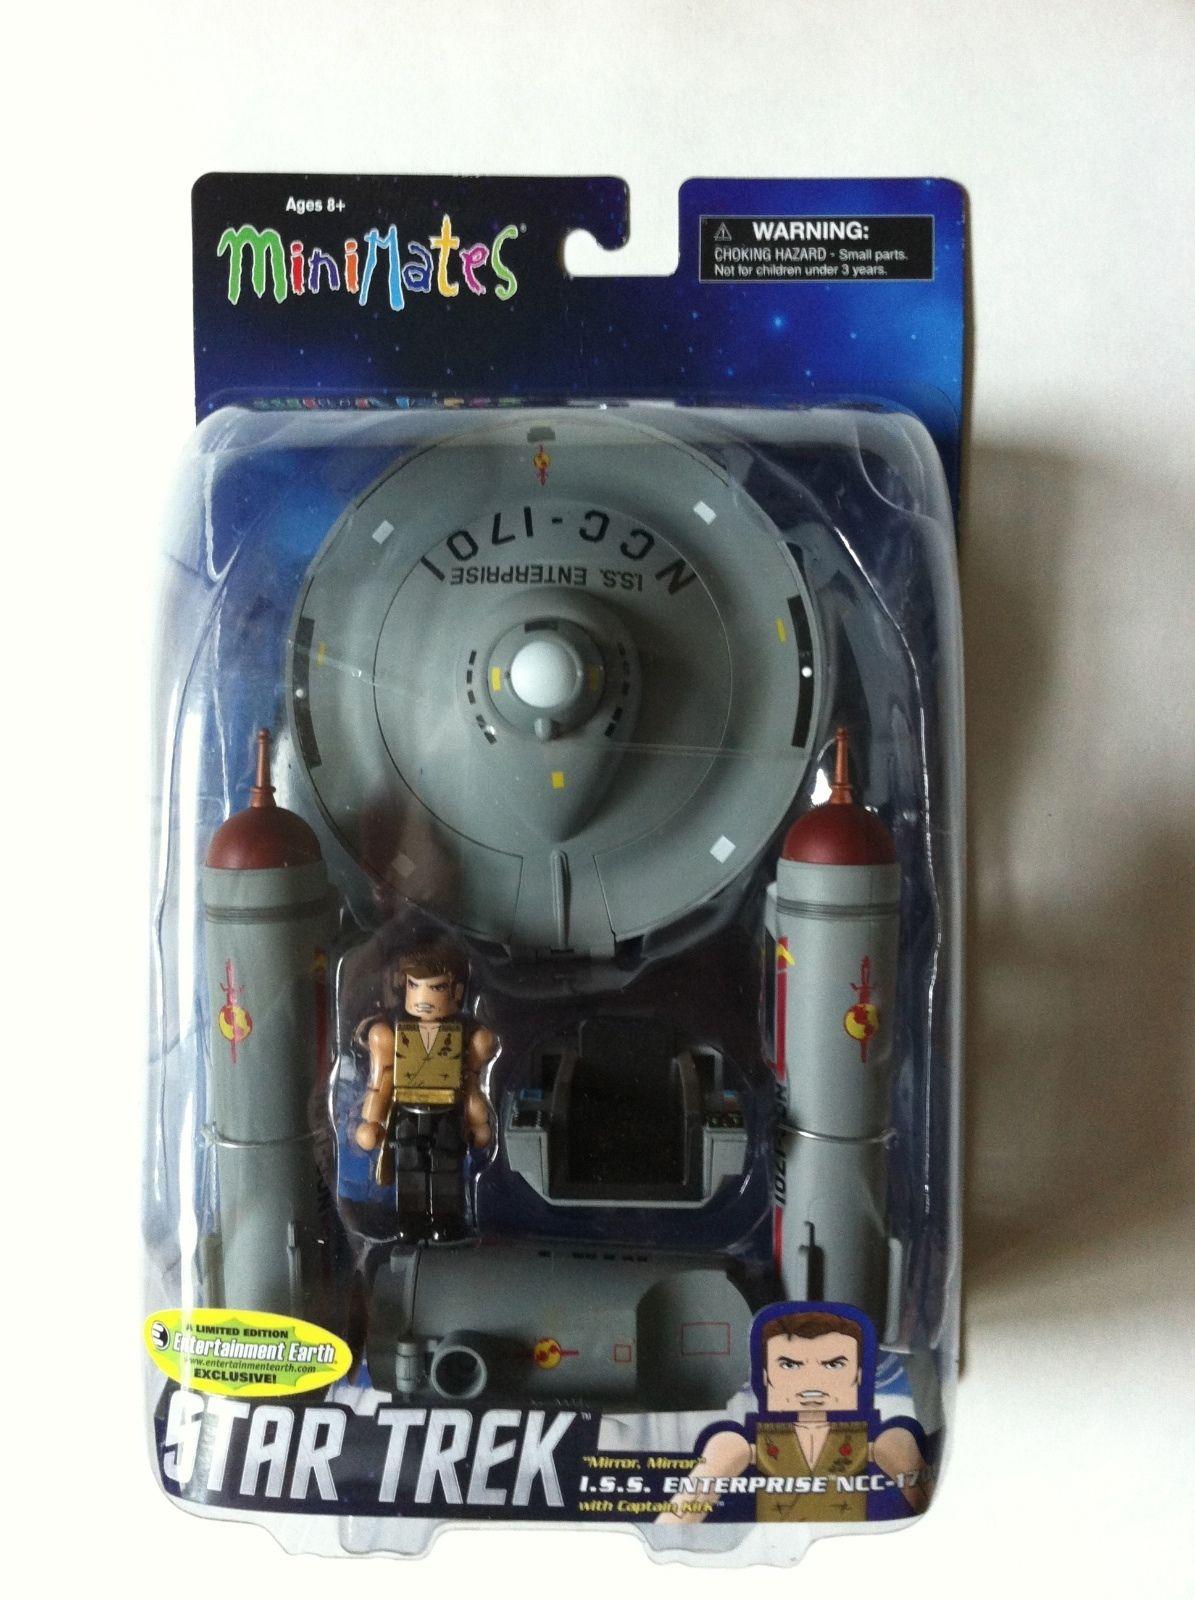 Minimates Star Trek Mirror Mirror Universe Enterprise Limited Edition of 1,000